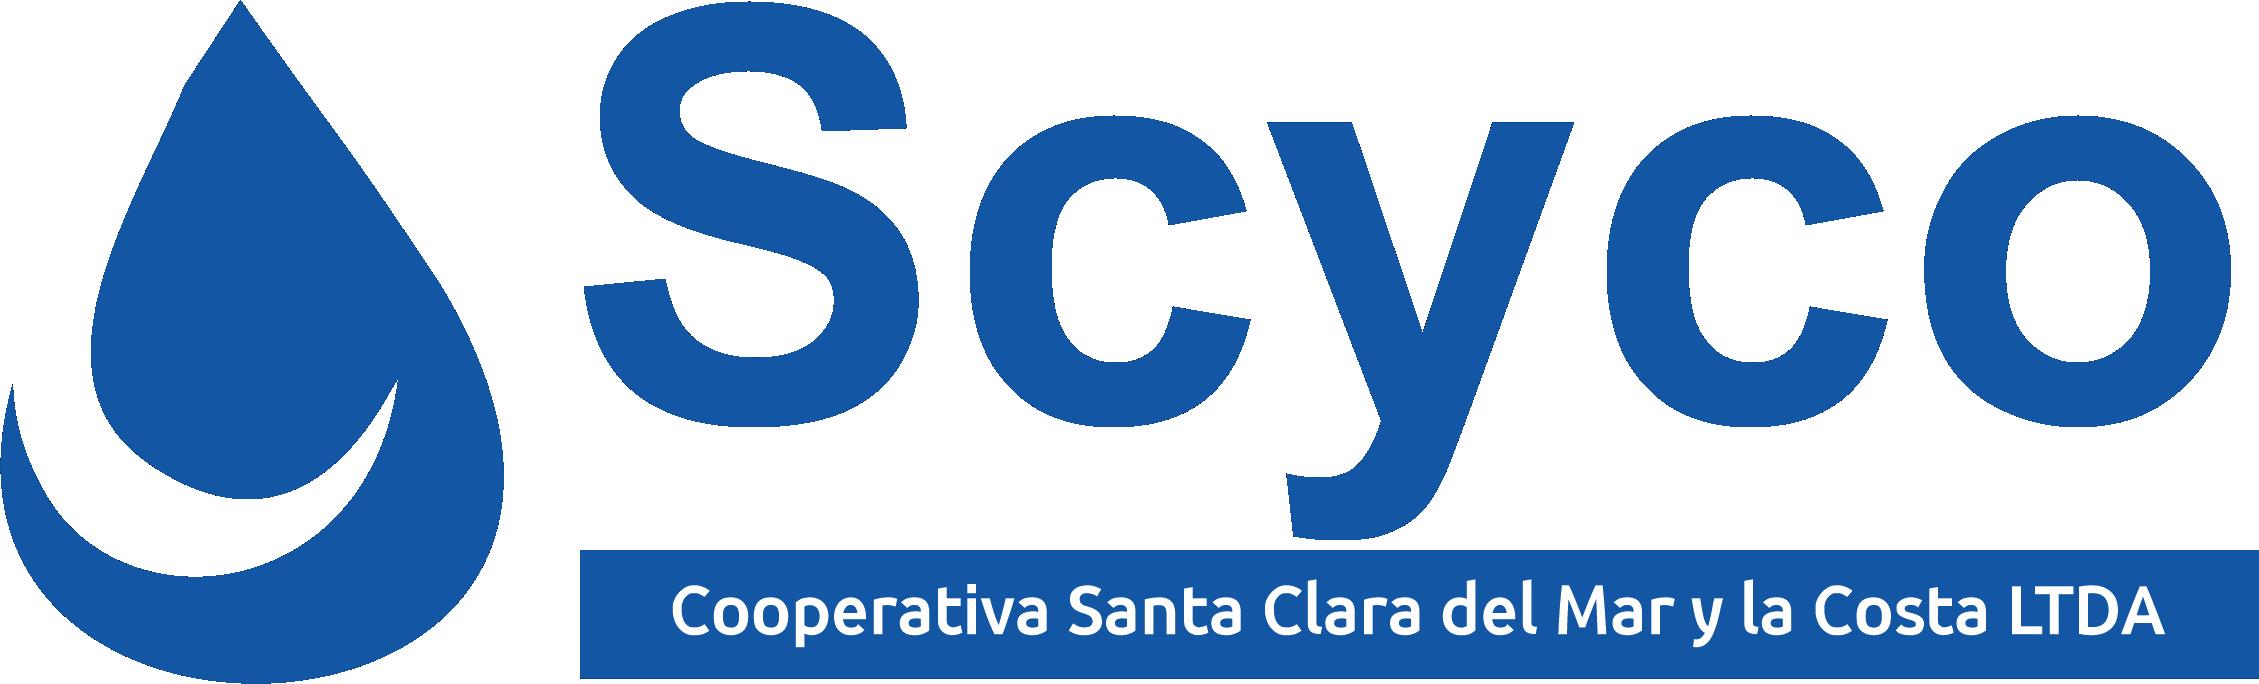 Cooperativa Scyco – Agua Corriente de Santa Clara del Mar